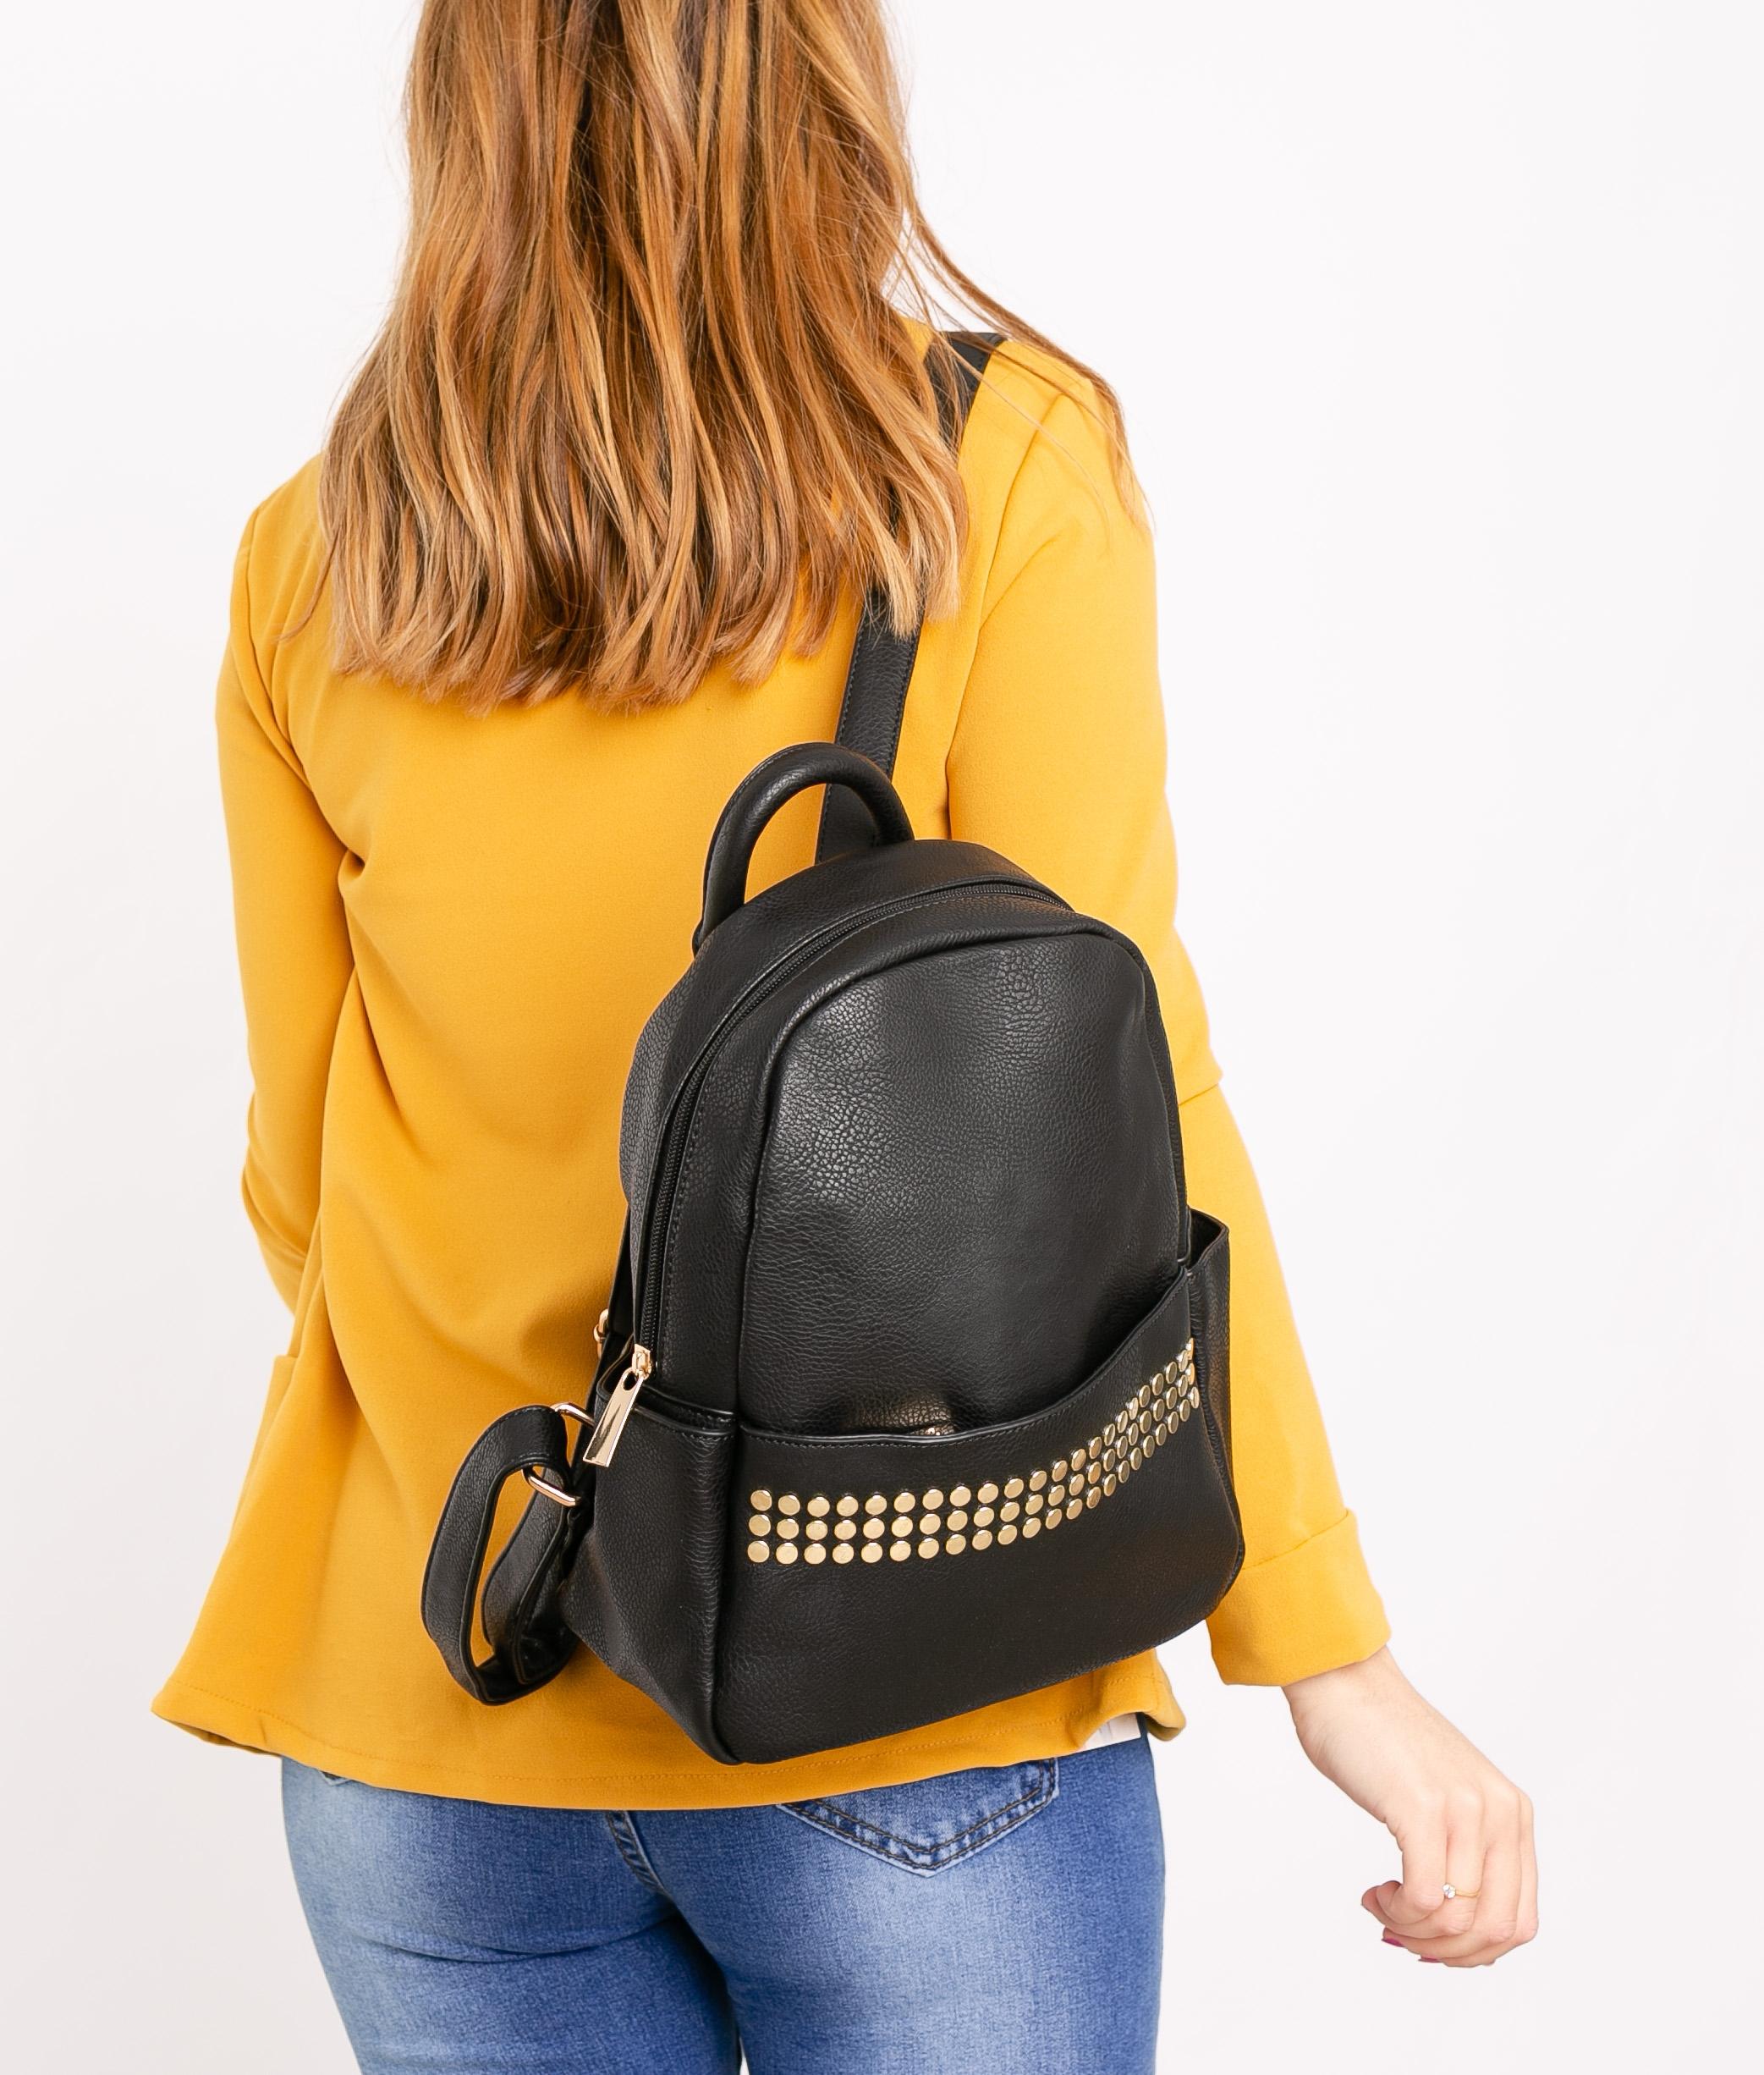 Backpack Zulaida - Camel